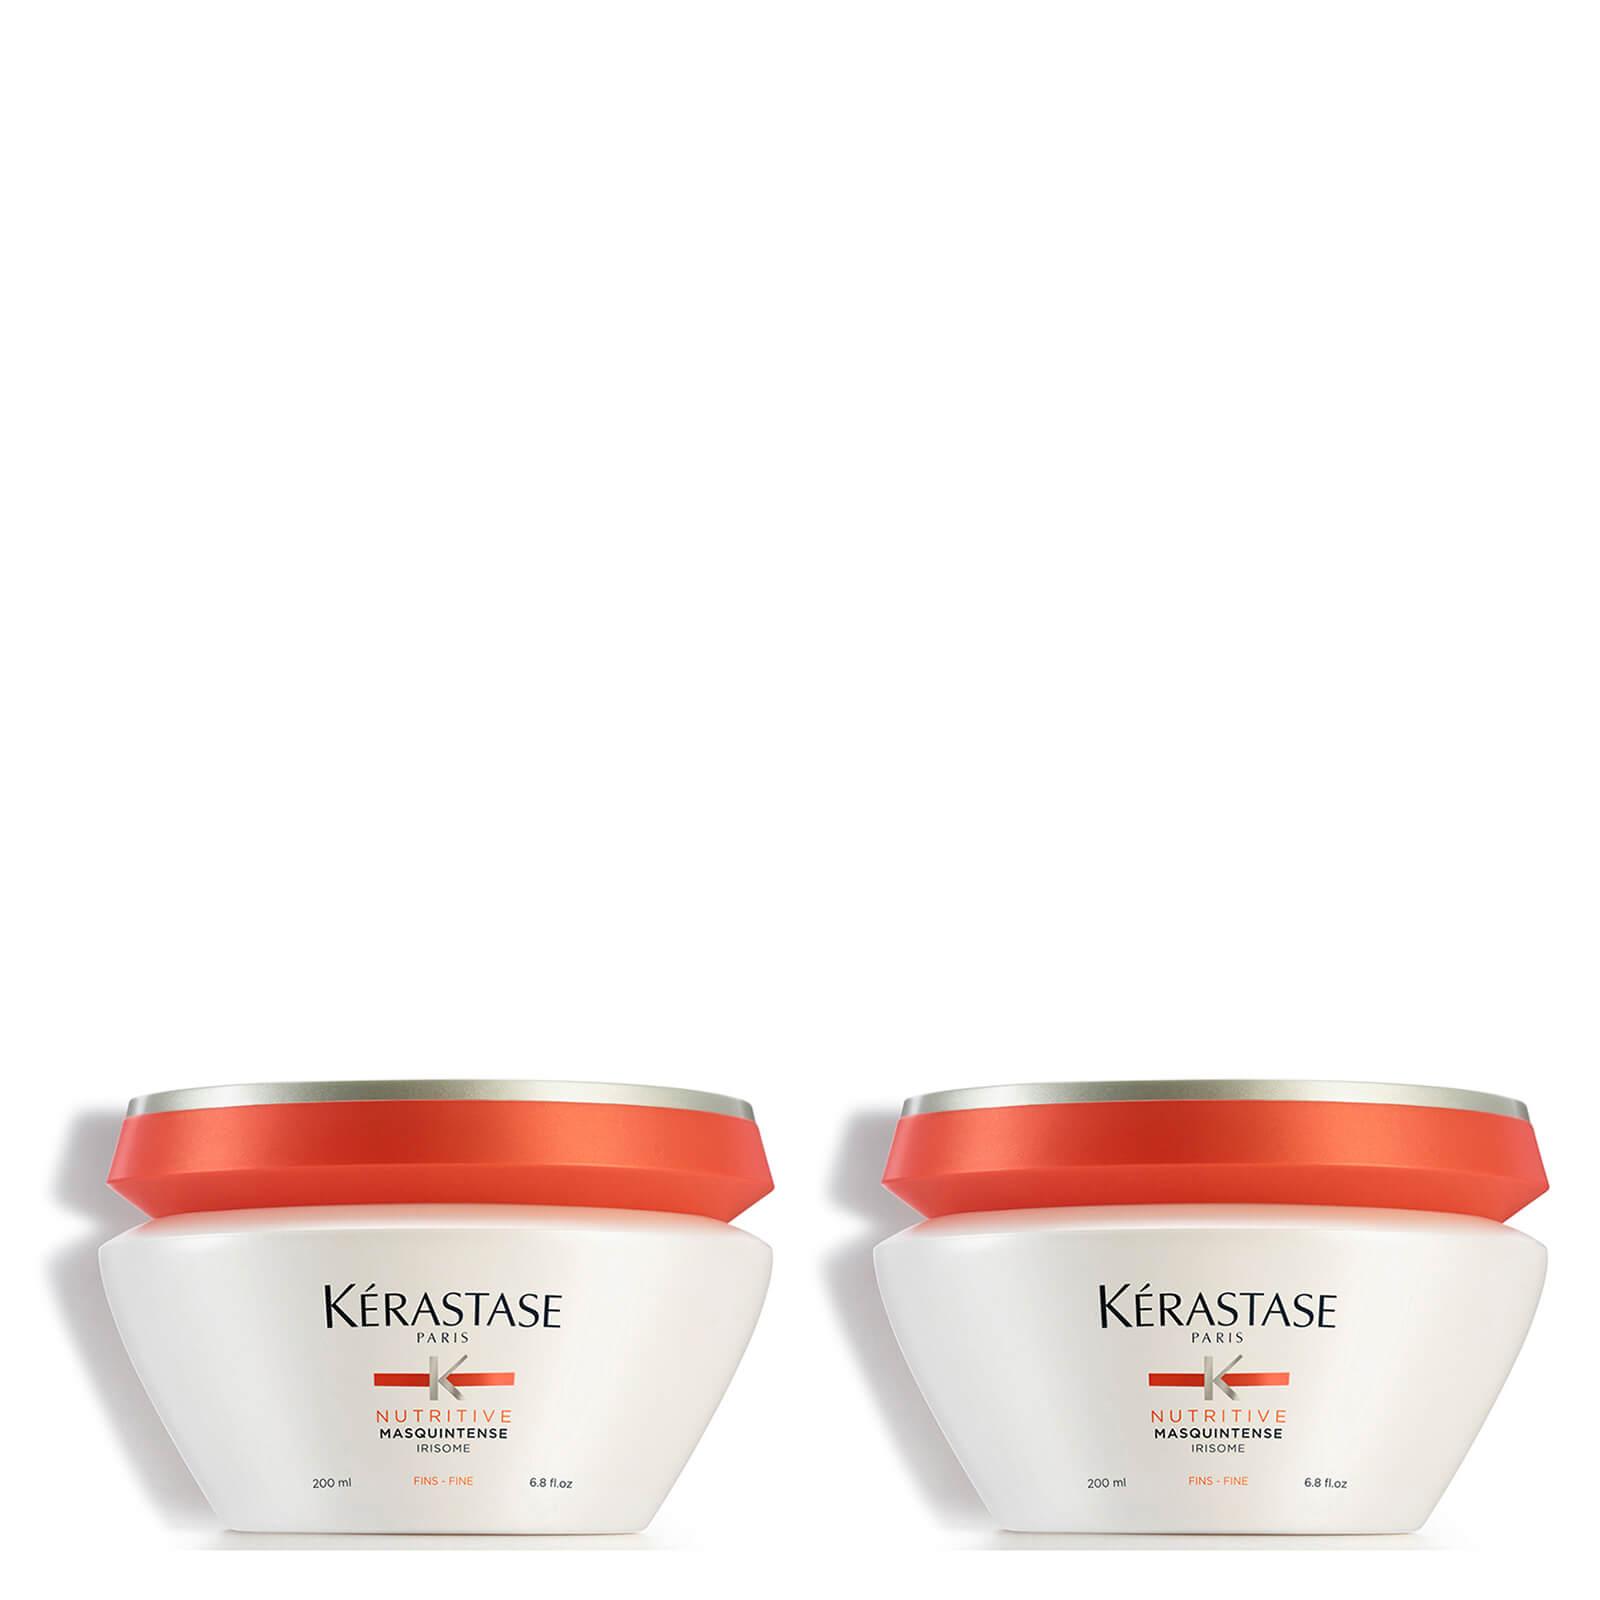 Kérastase Nutritive Masquintense Cheveux Fins For Fine Hair 200ml Duo